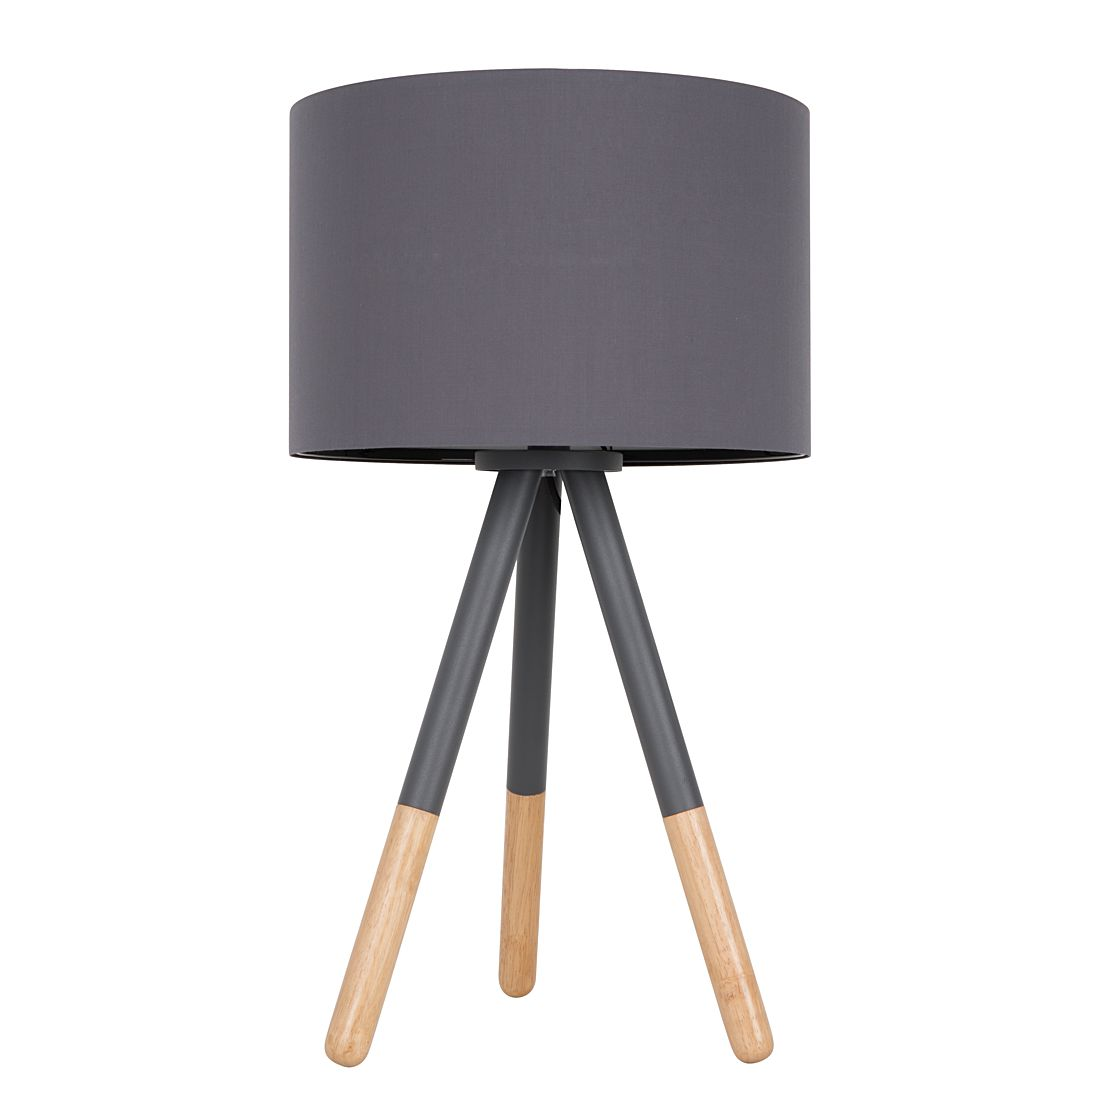 Tischleuchte HIGHLAND ● Metall/Holz ● 1-flammig- Zuiver A++